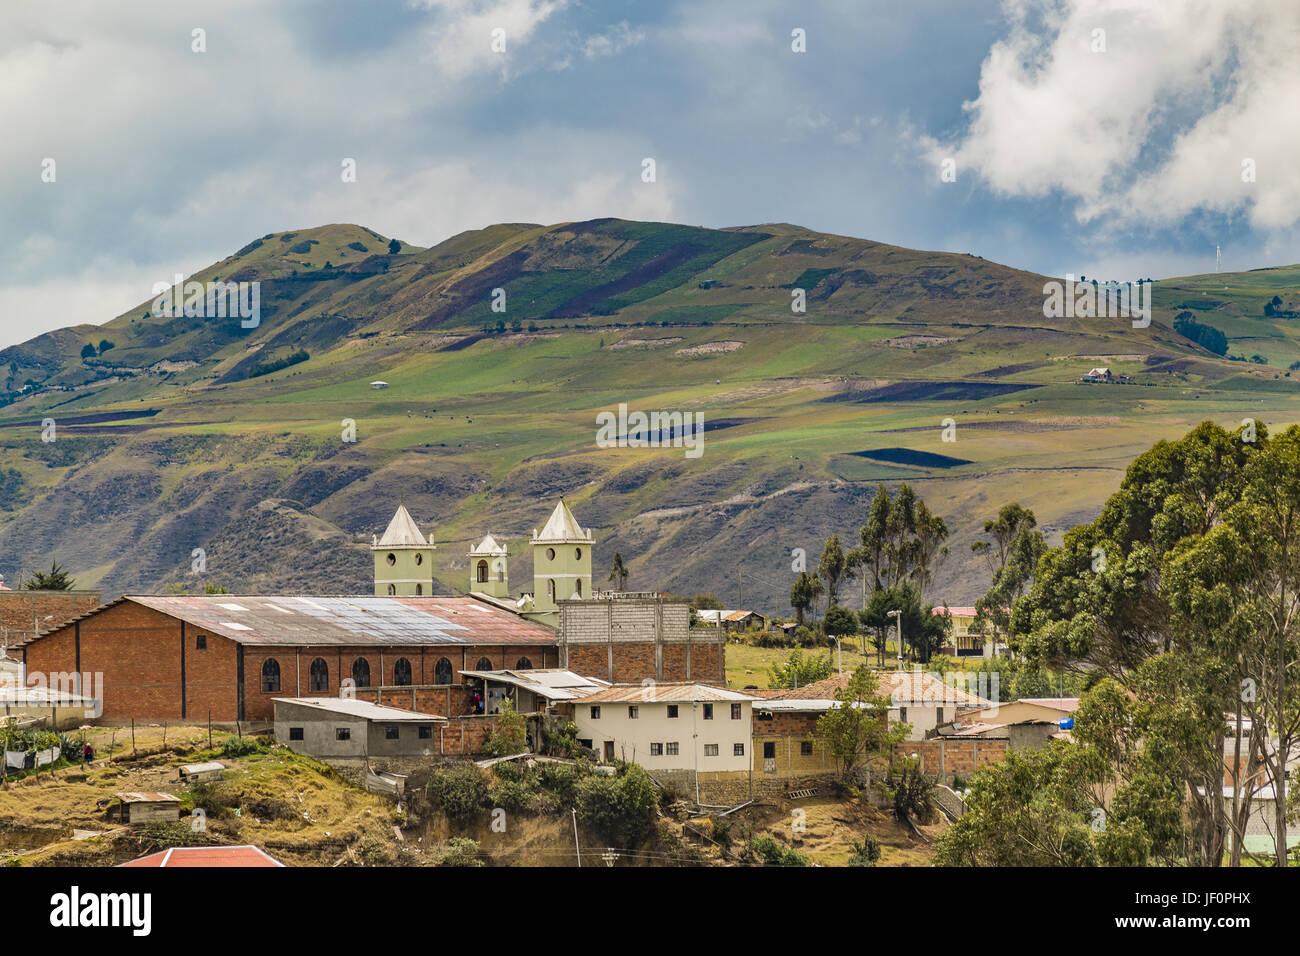 Andean Town Landscape Scene Azuay Ecuador - Stock Image